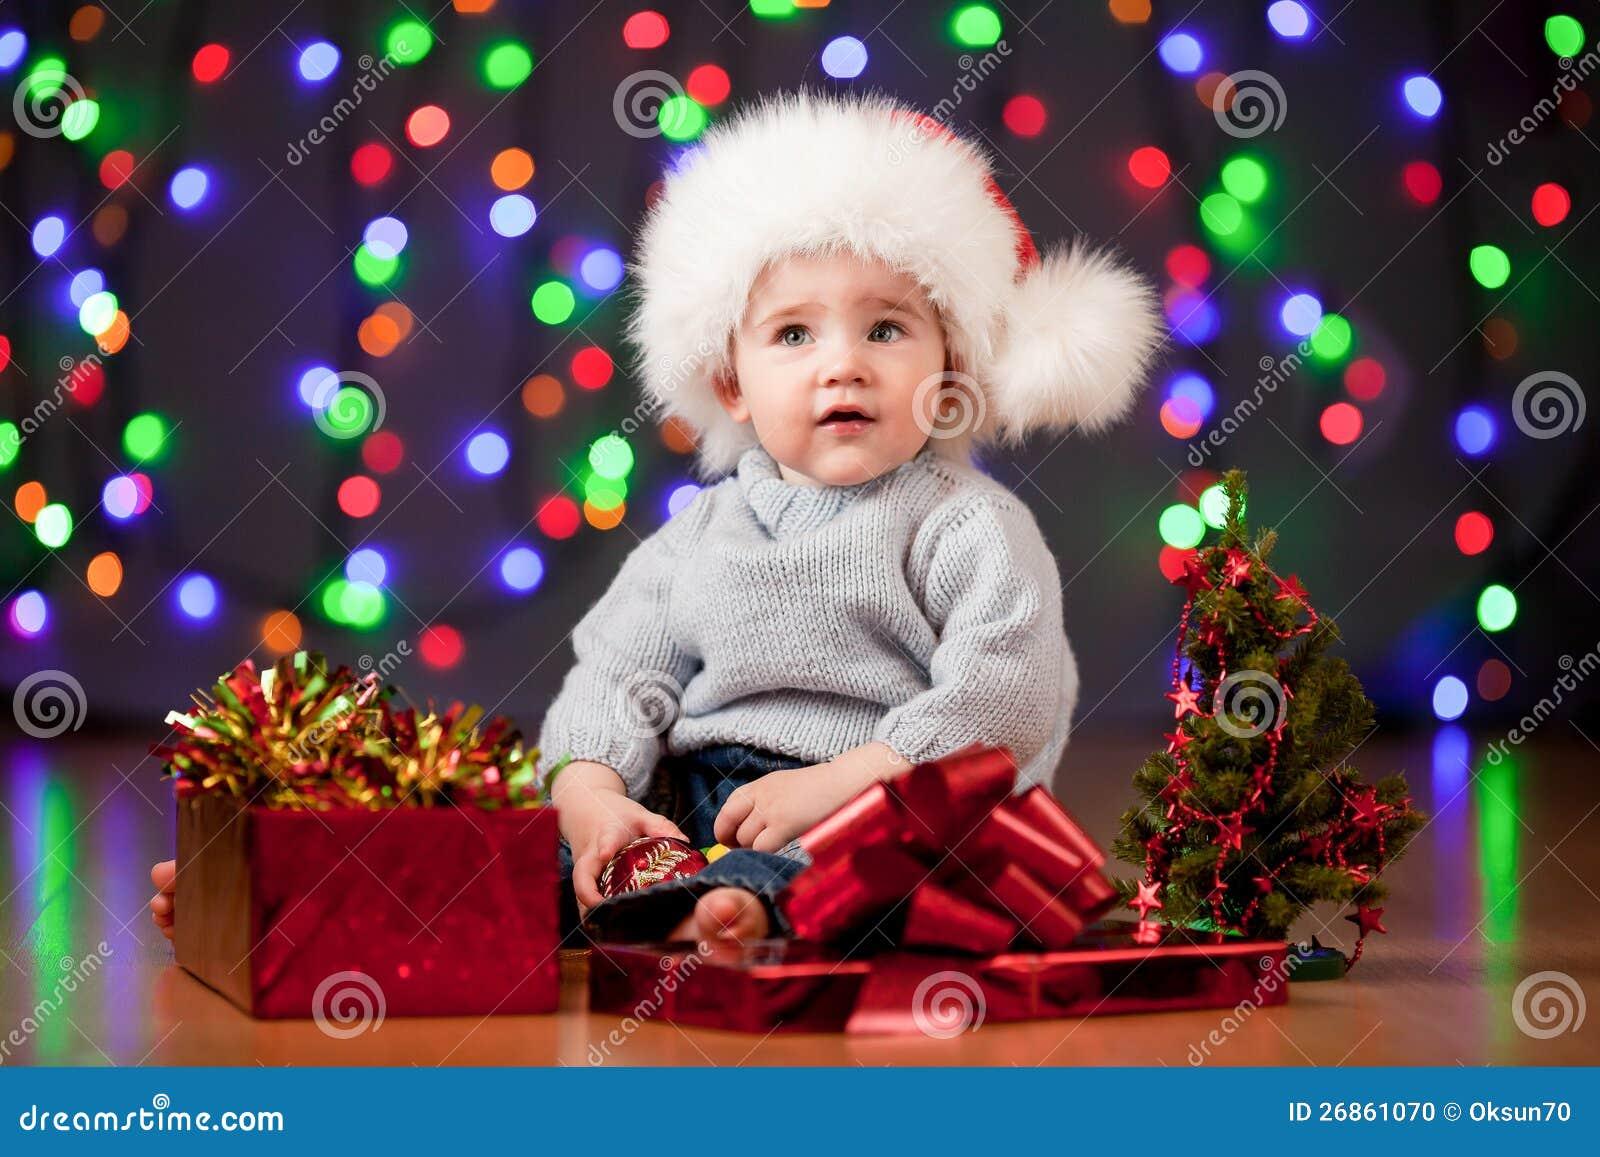 cbbec68abdadf Funny Baby In Santa Hat On Festive Background Stock Photo - Image of ...